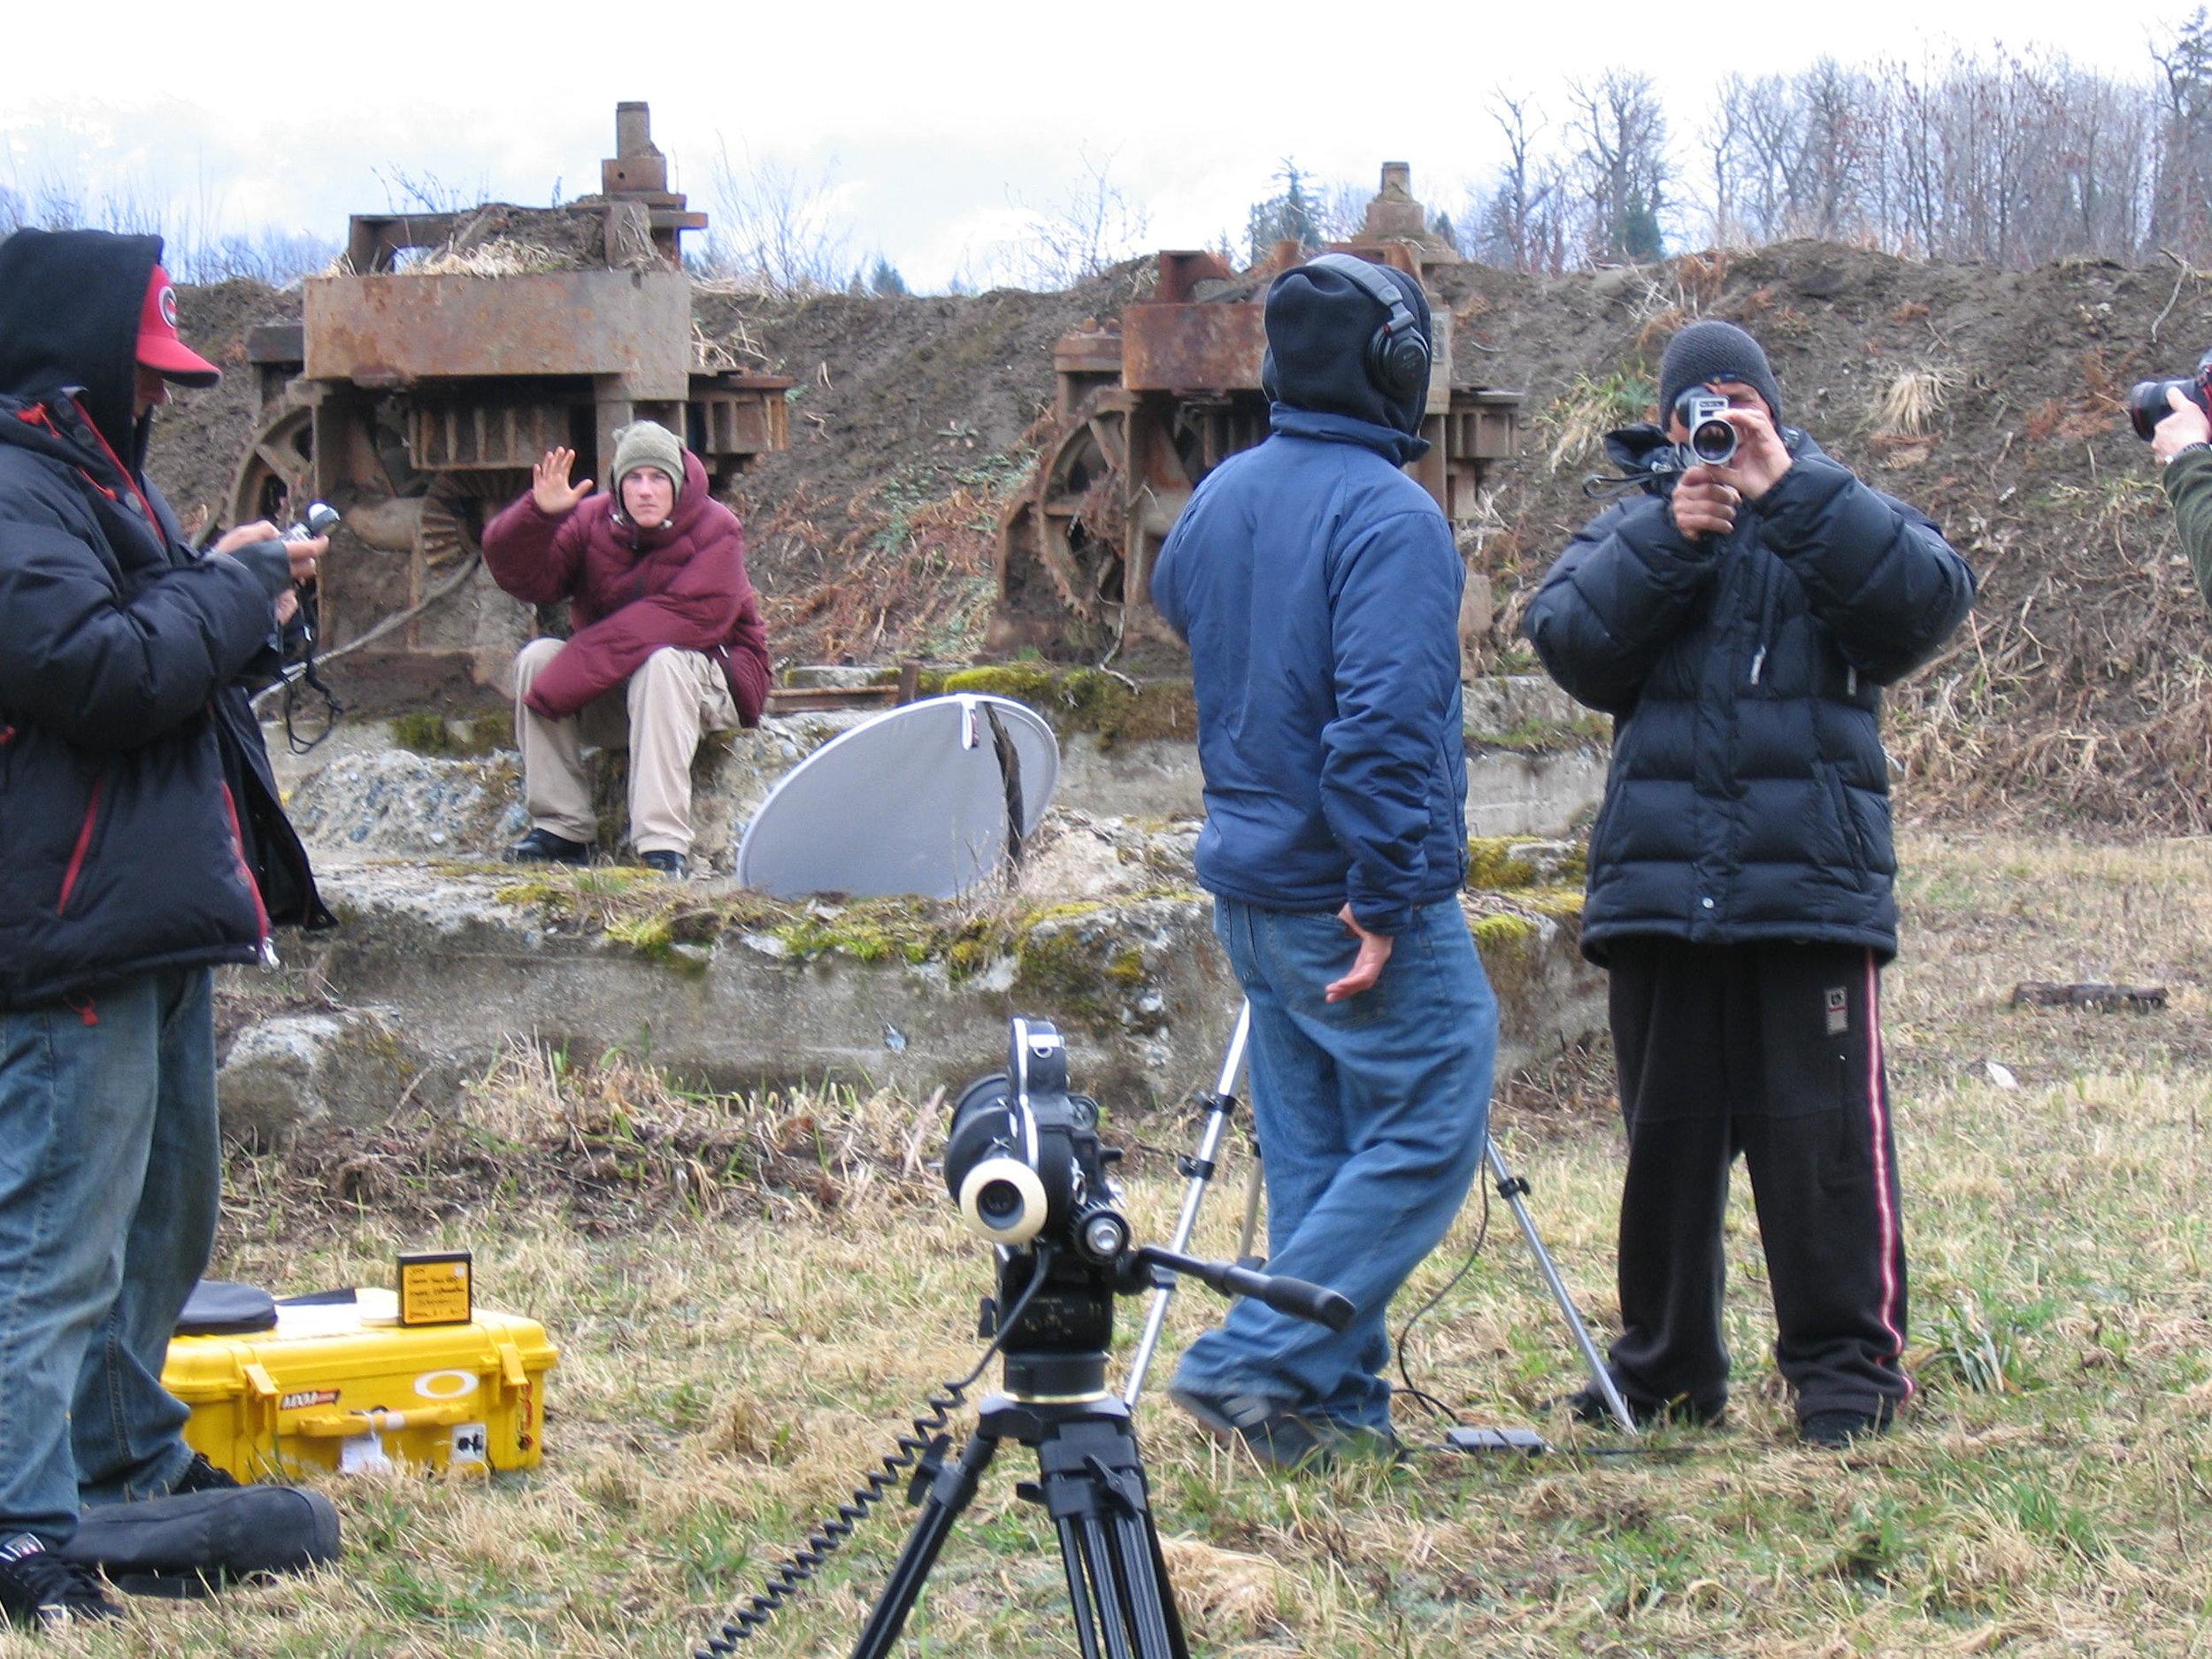 Freddy Kalbermatten, and Mike Hatchett on camera /photo: Dano Pendygrasse